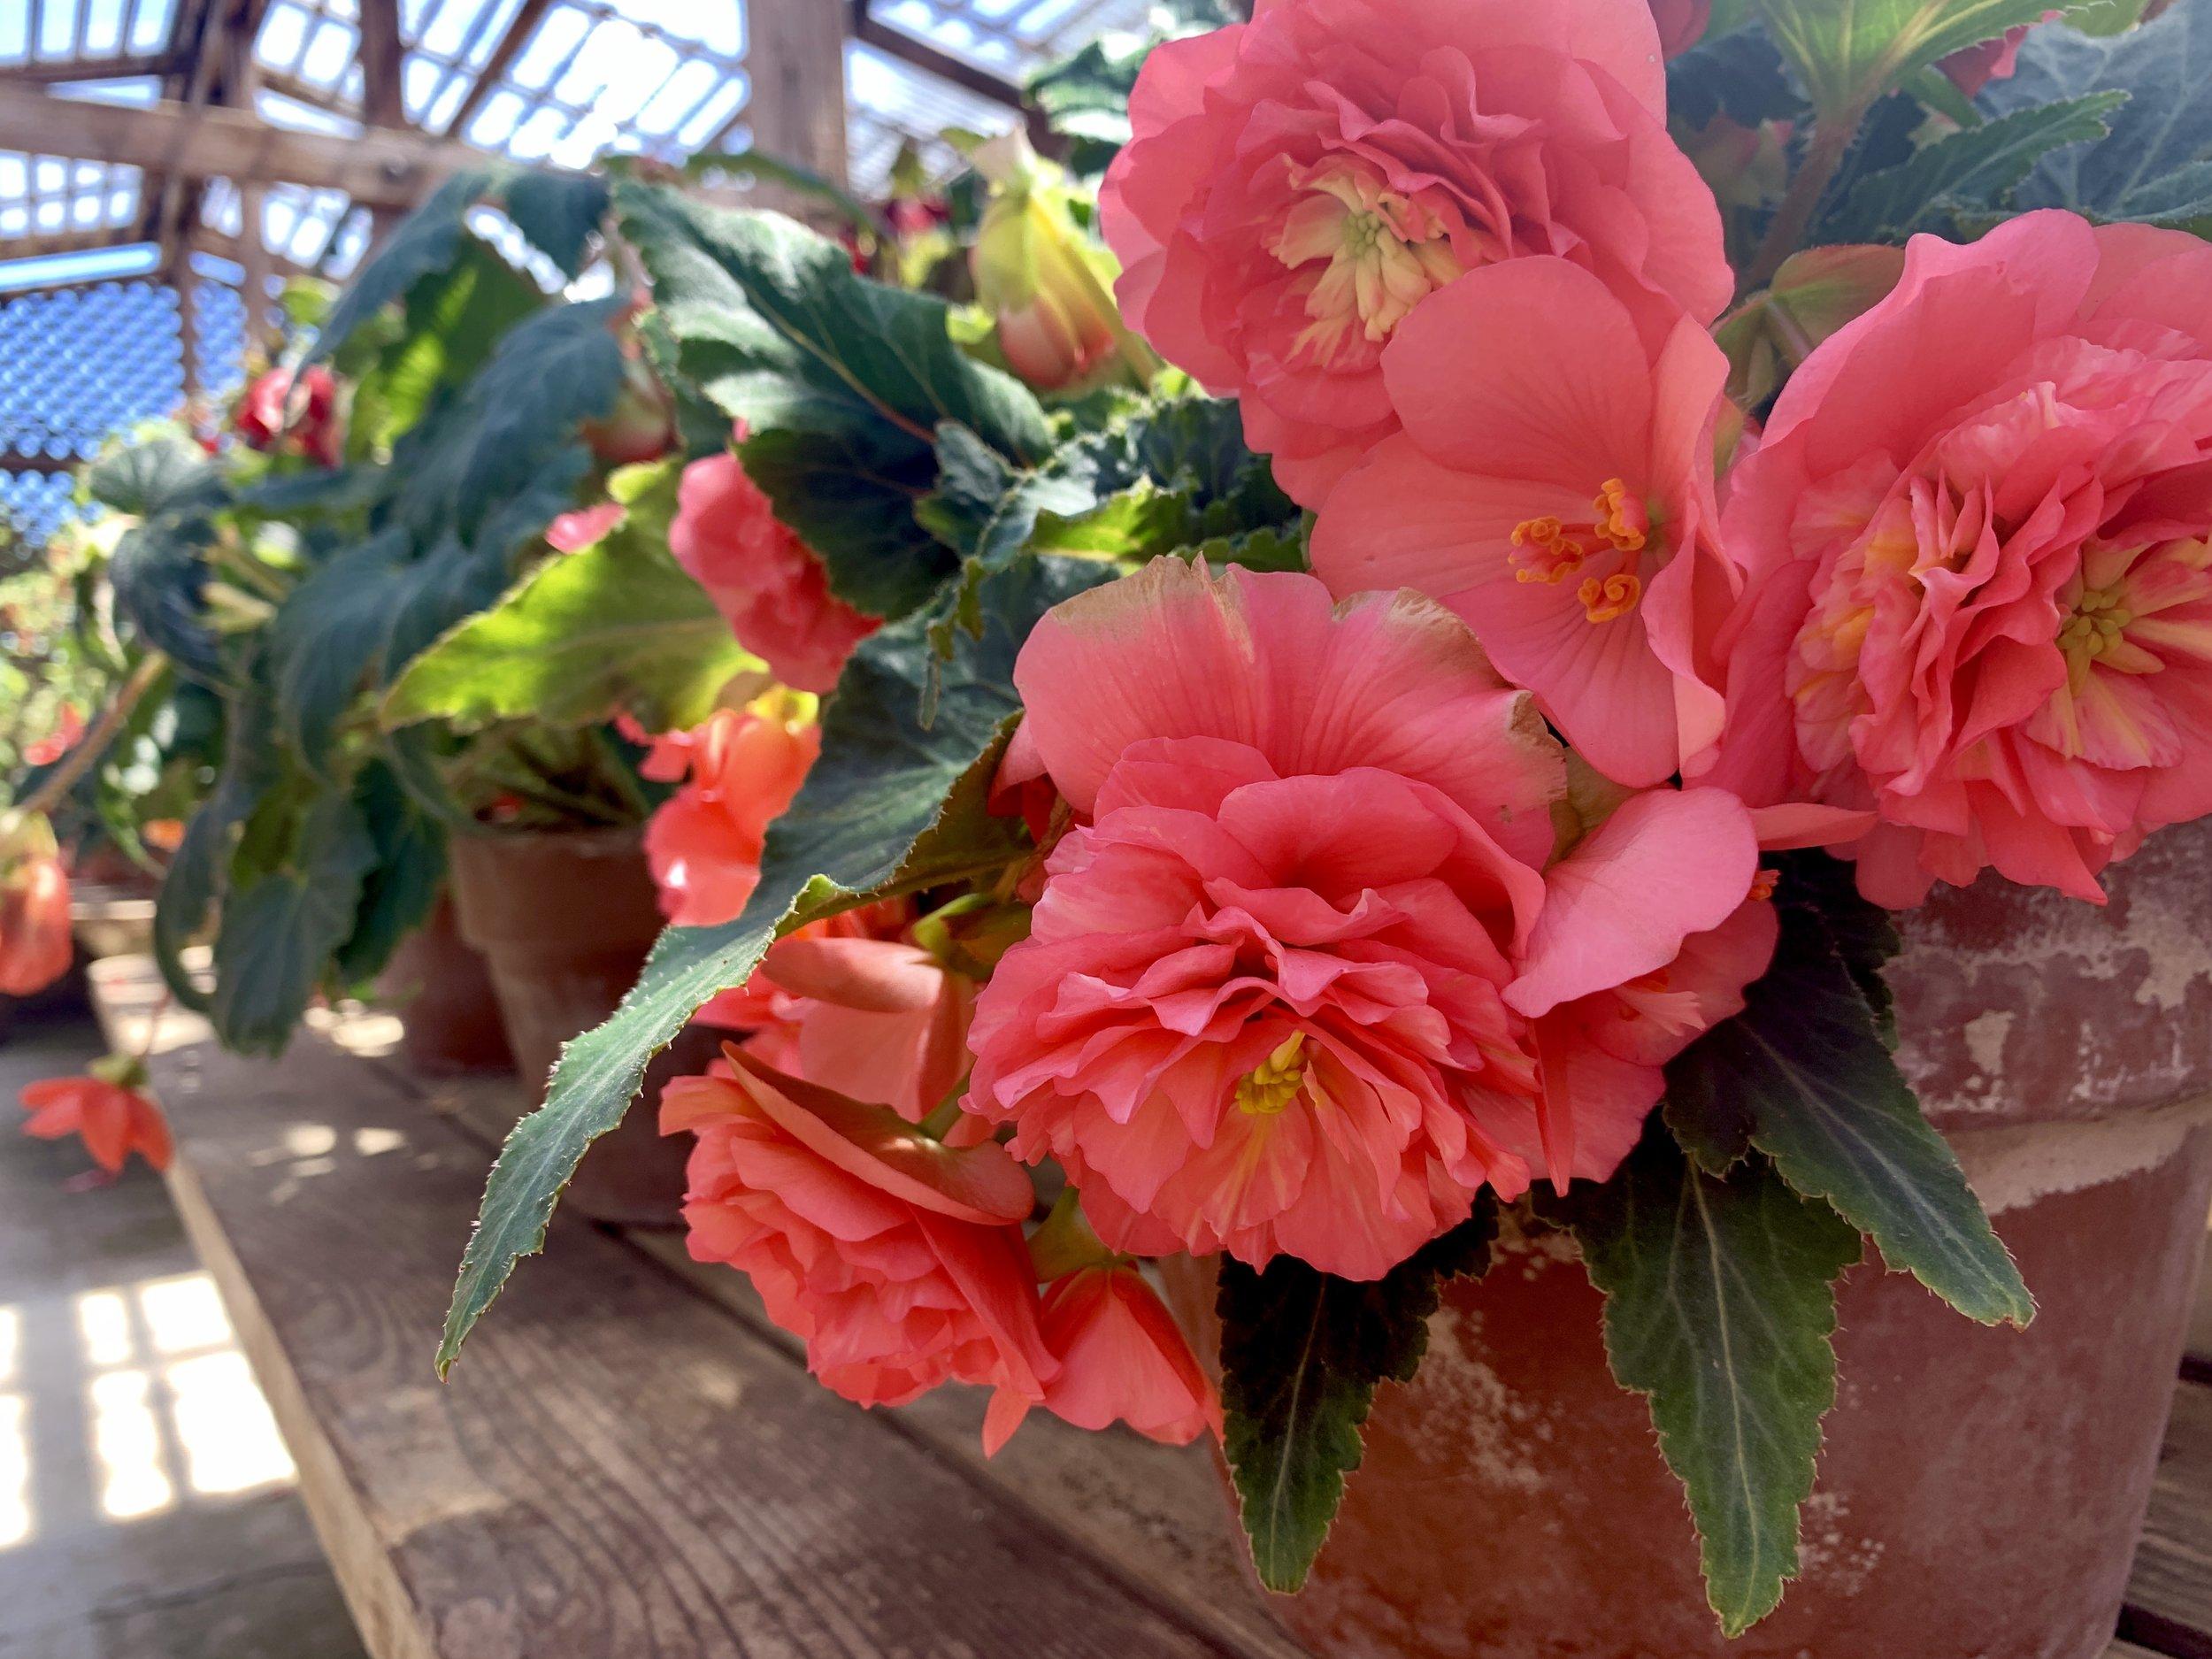 Begonia beauties